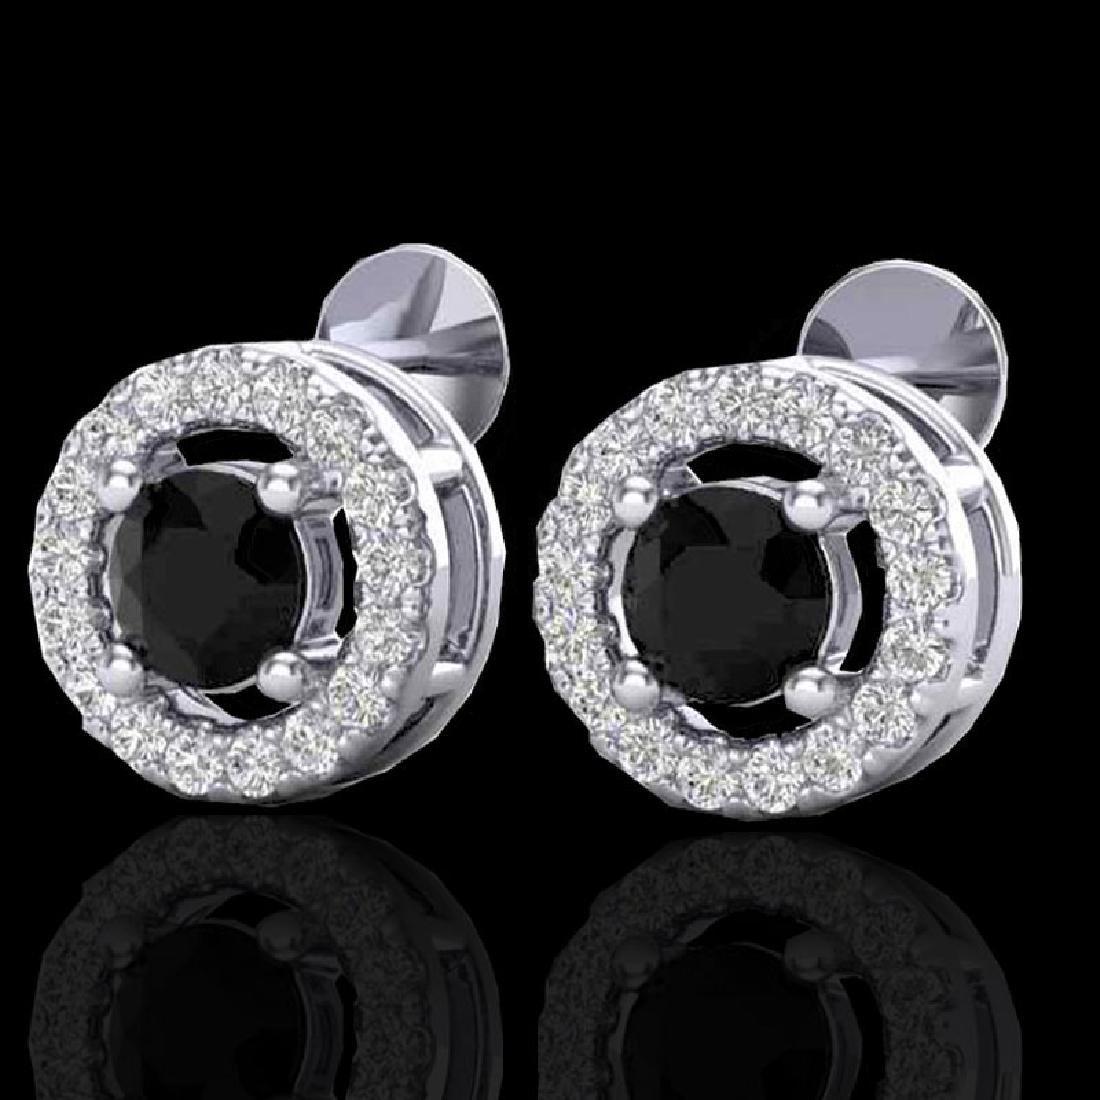 0.75 CTW Micro Pave VS/SI Diamond Earrings Halo 18K